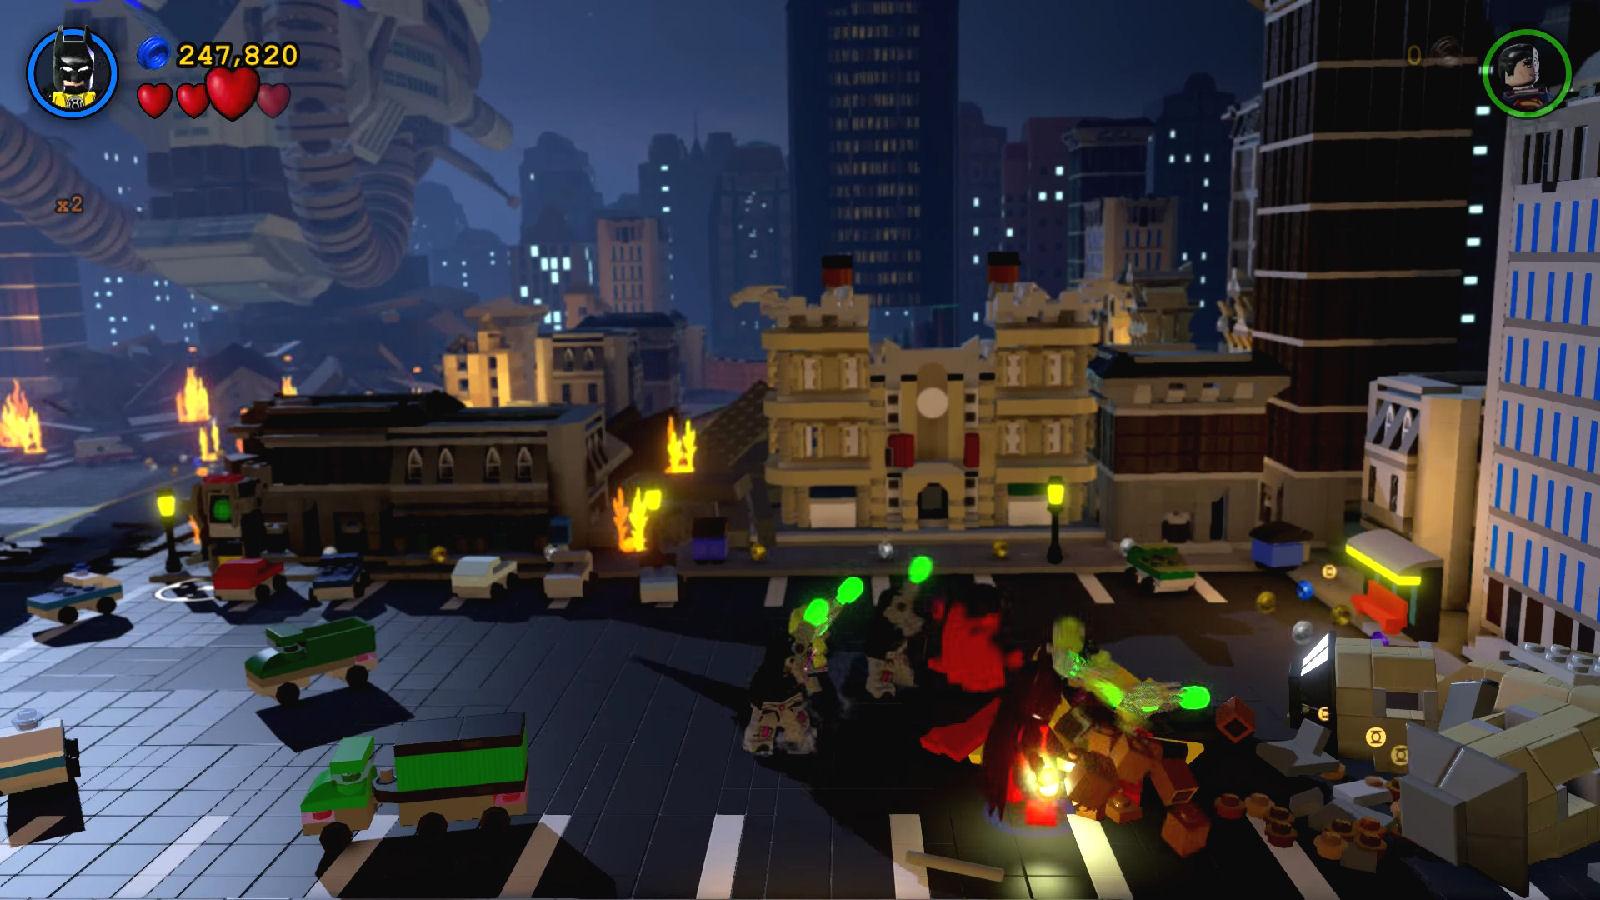 lego batman 3 red brick 8 minikit detector location rh videogamesblogger com LEGO Batman Drawings LEGO Batman Drawings